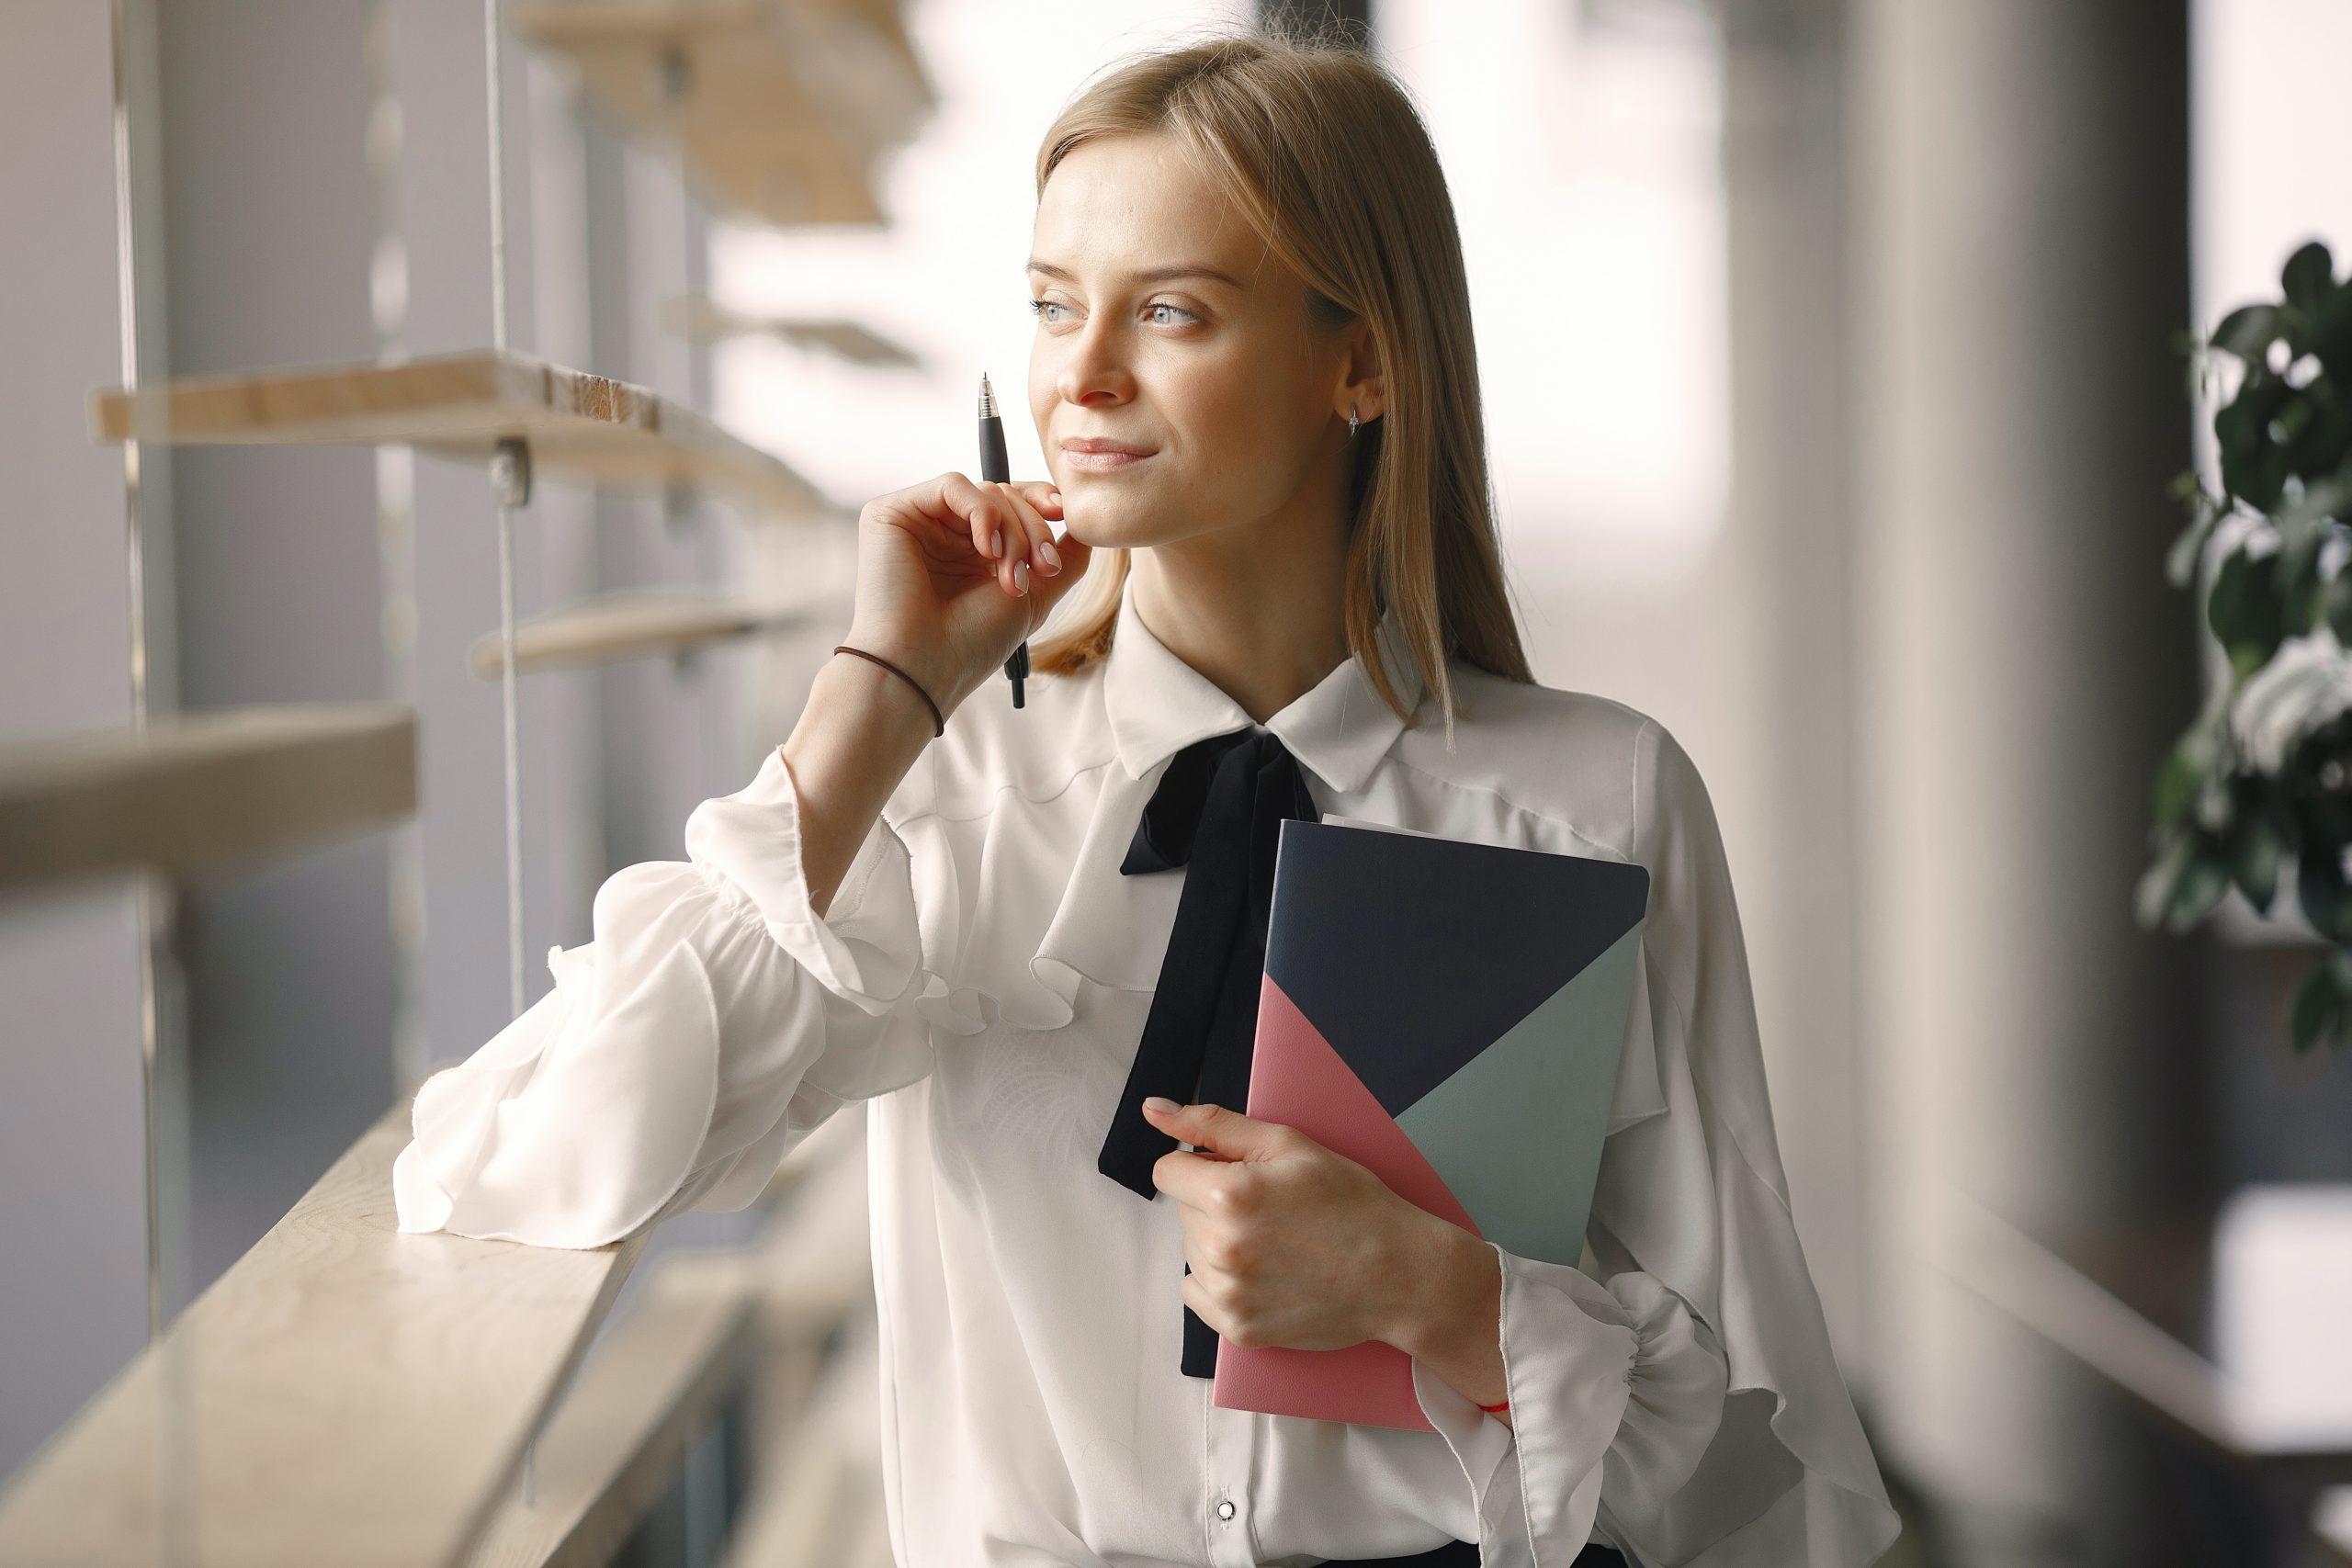 Auge-legal-fiscal-funcions-secretaria-direccio